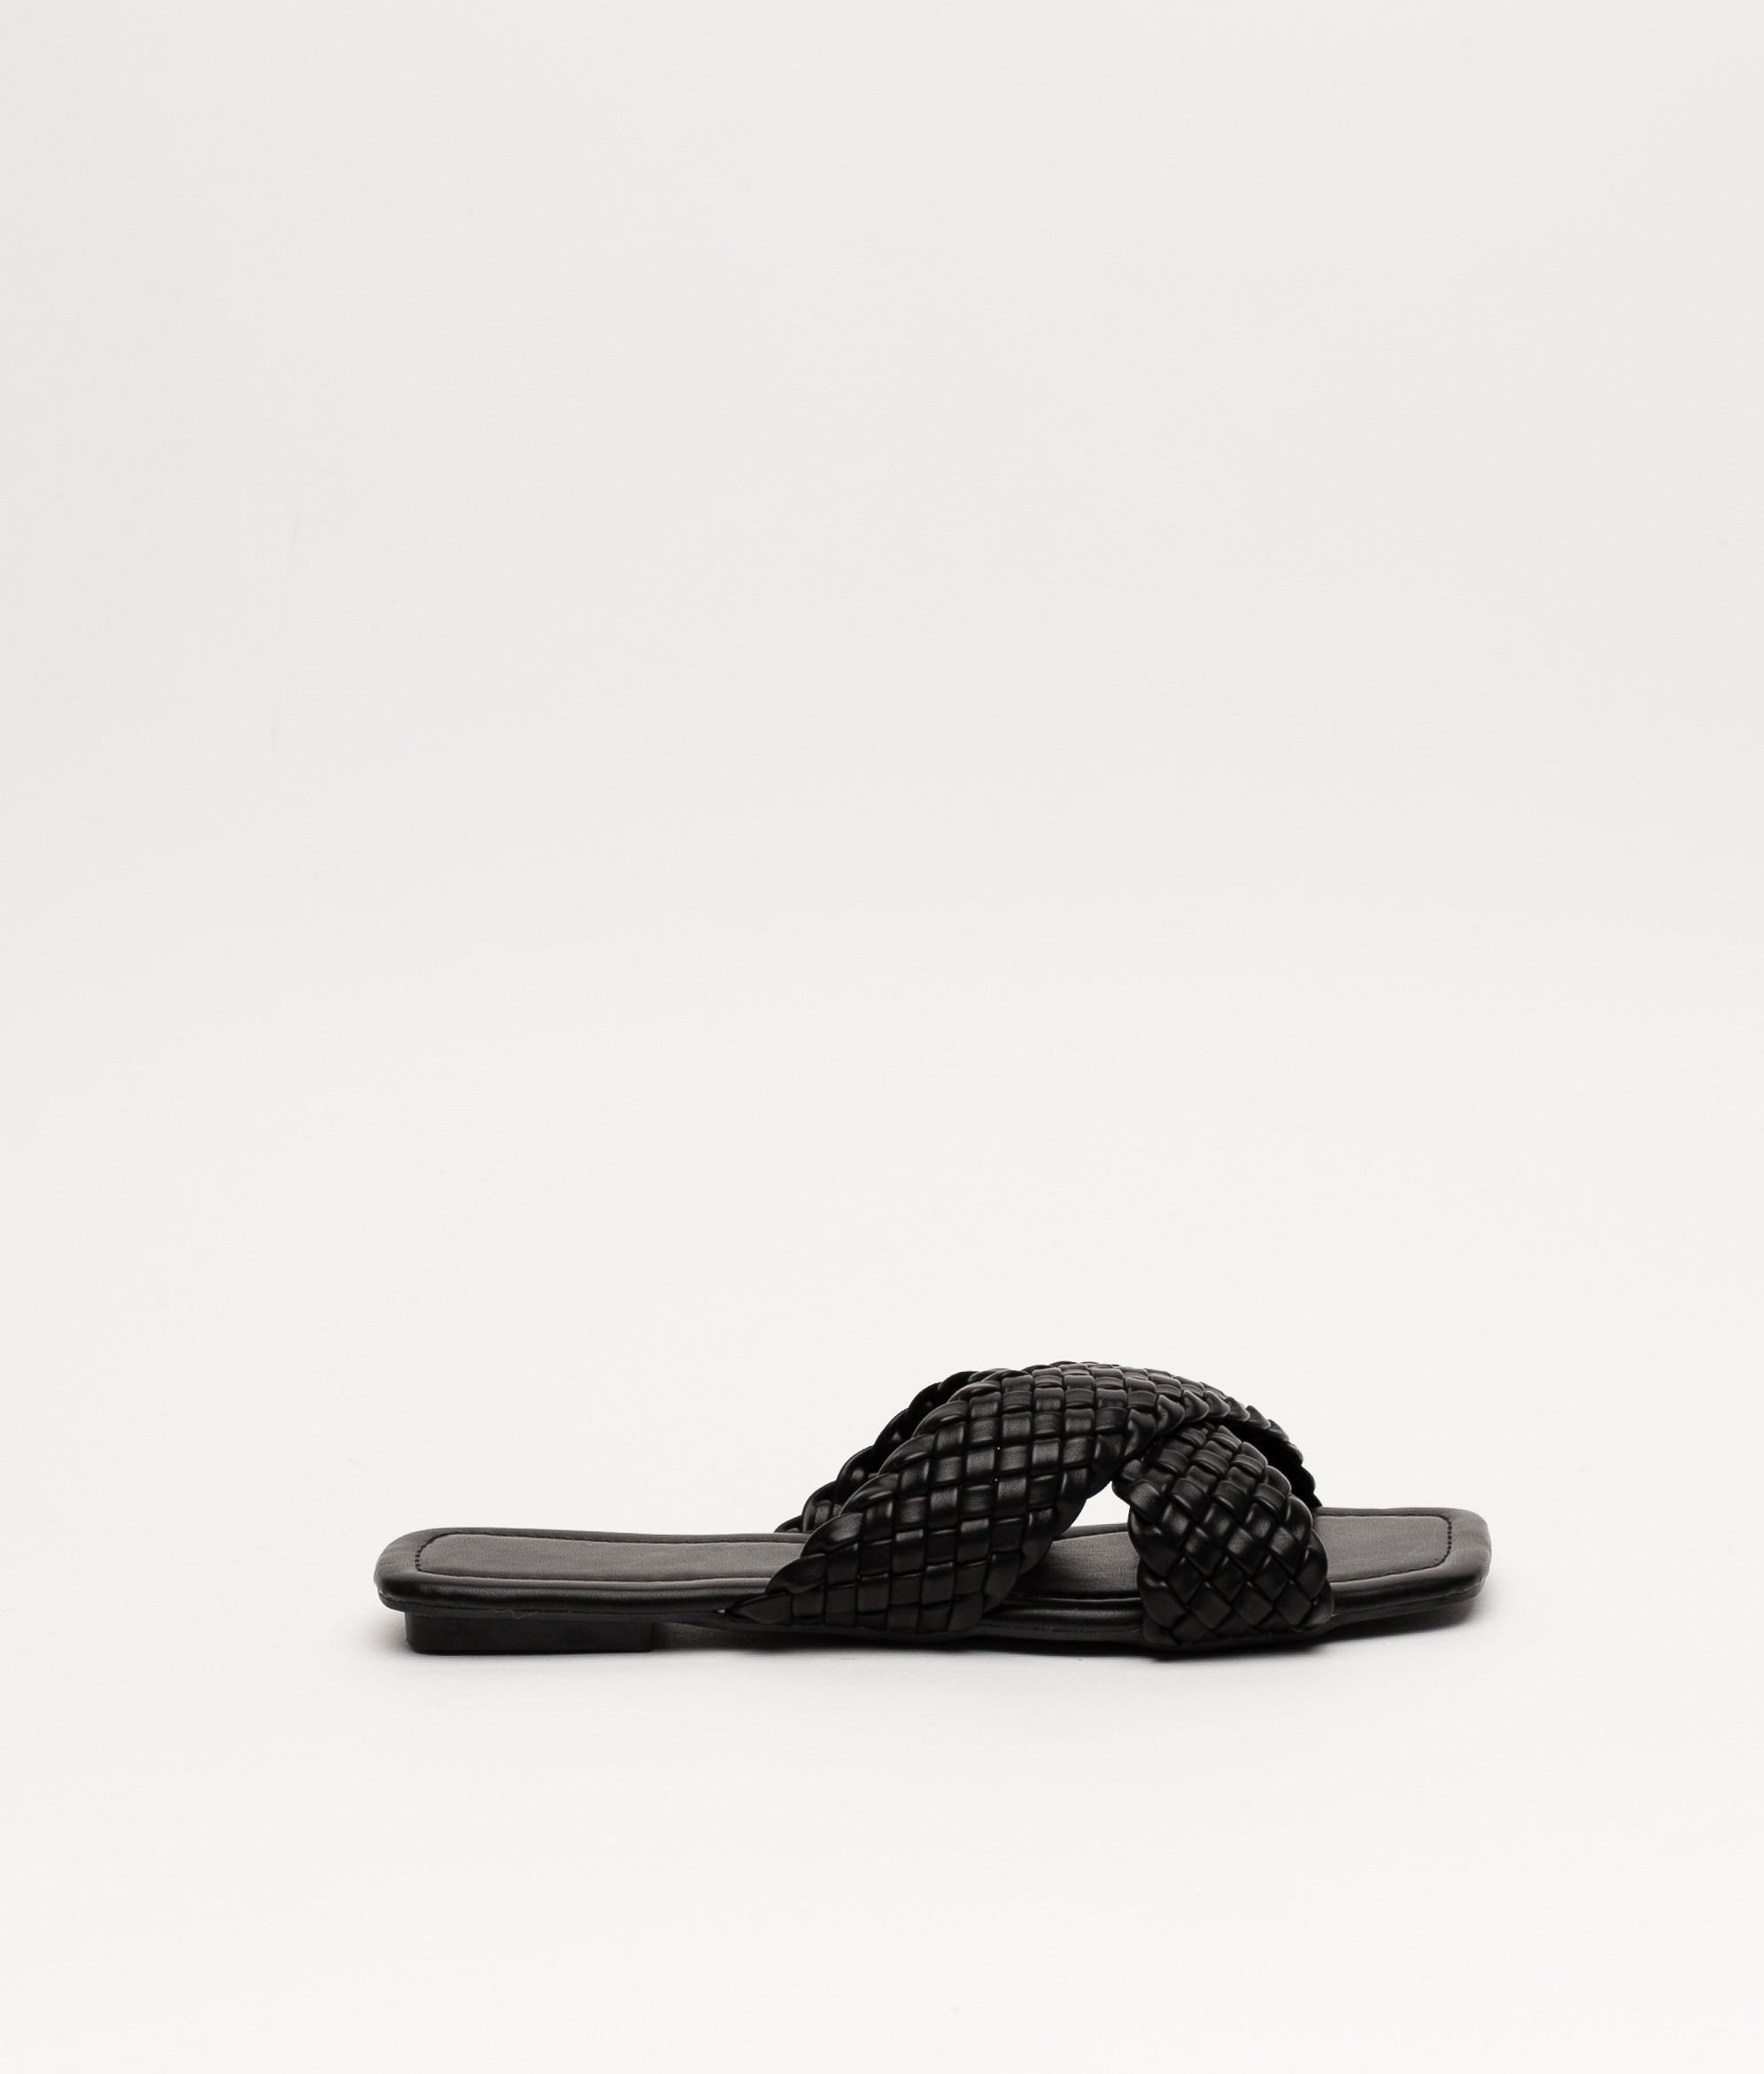 CORKE SANDAL - BLACK